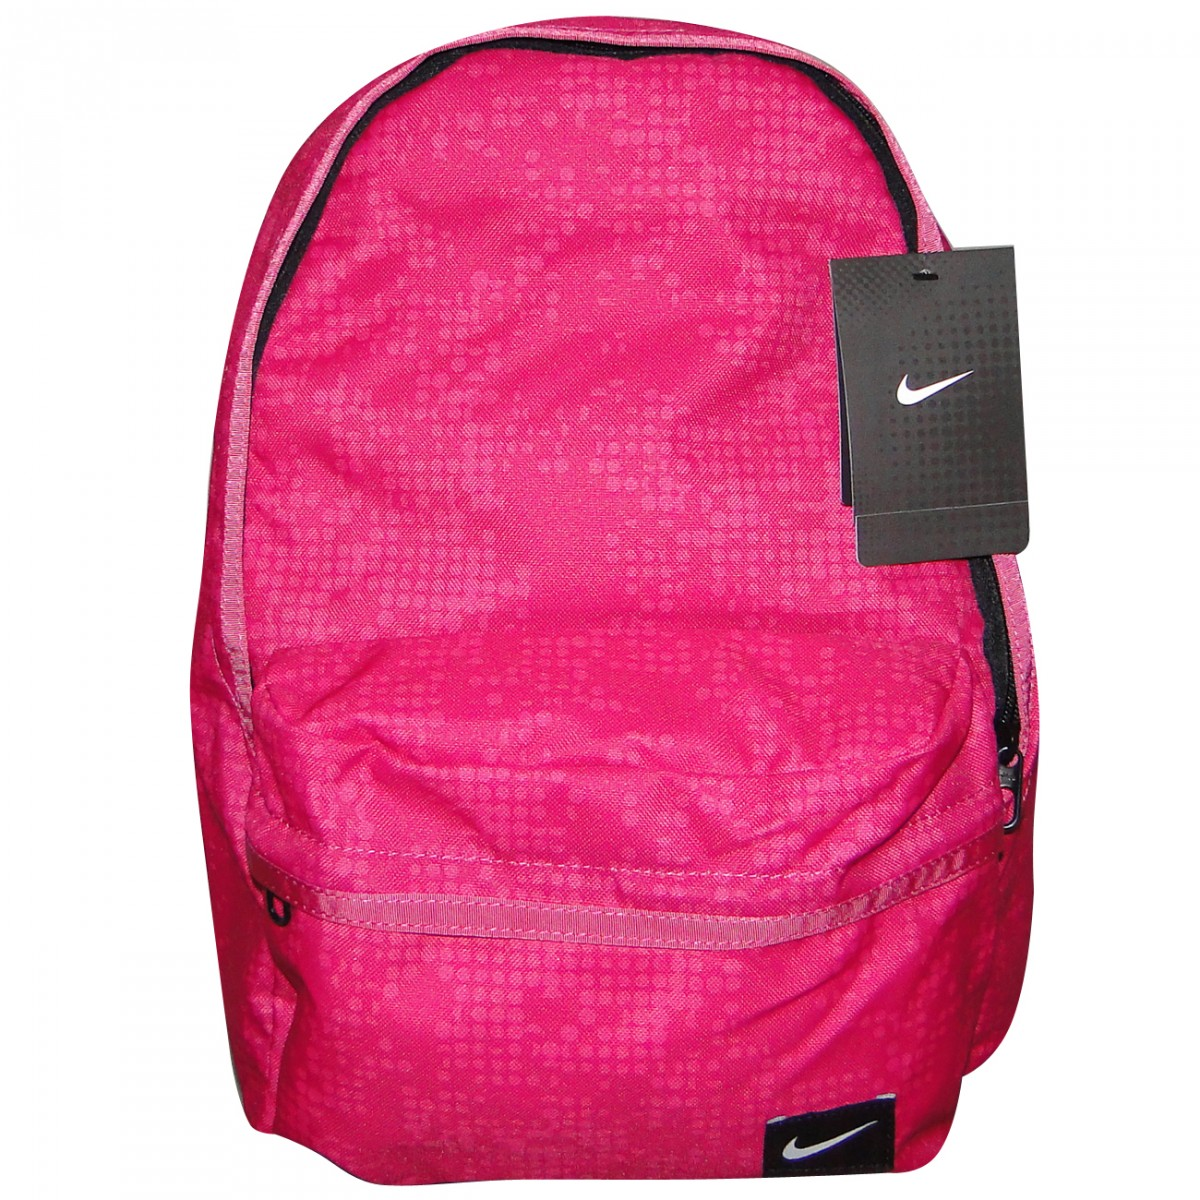 Bolsa Feminina De Couro Nike : Mochila nike ref ba  pink preto chuteira